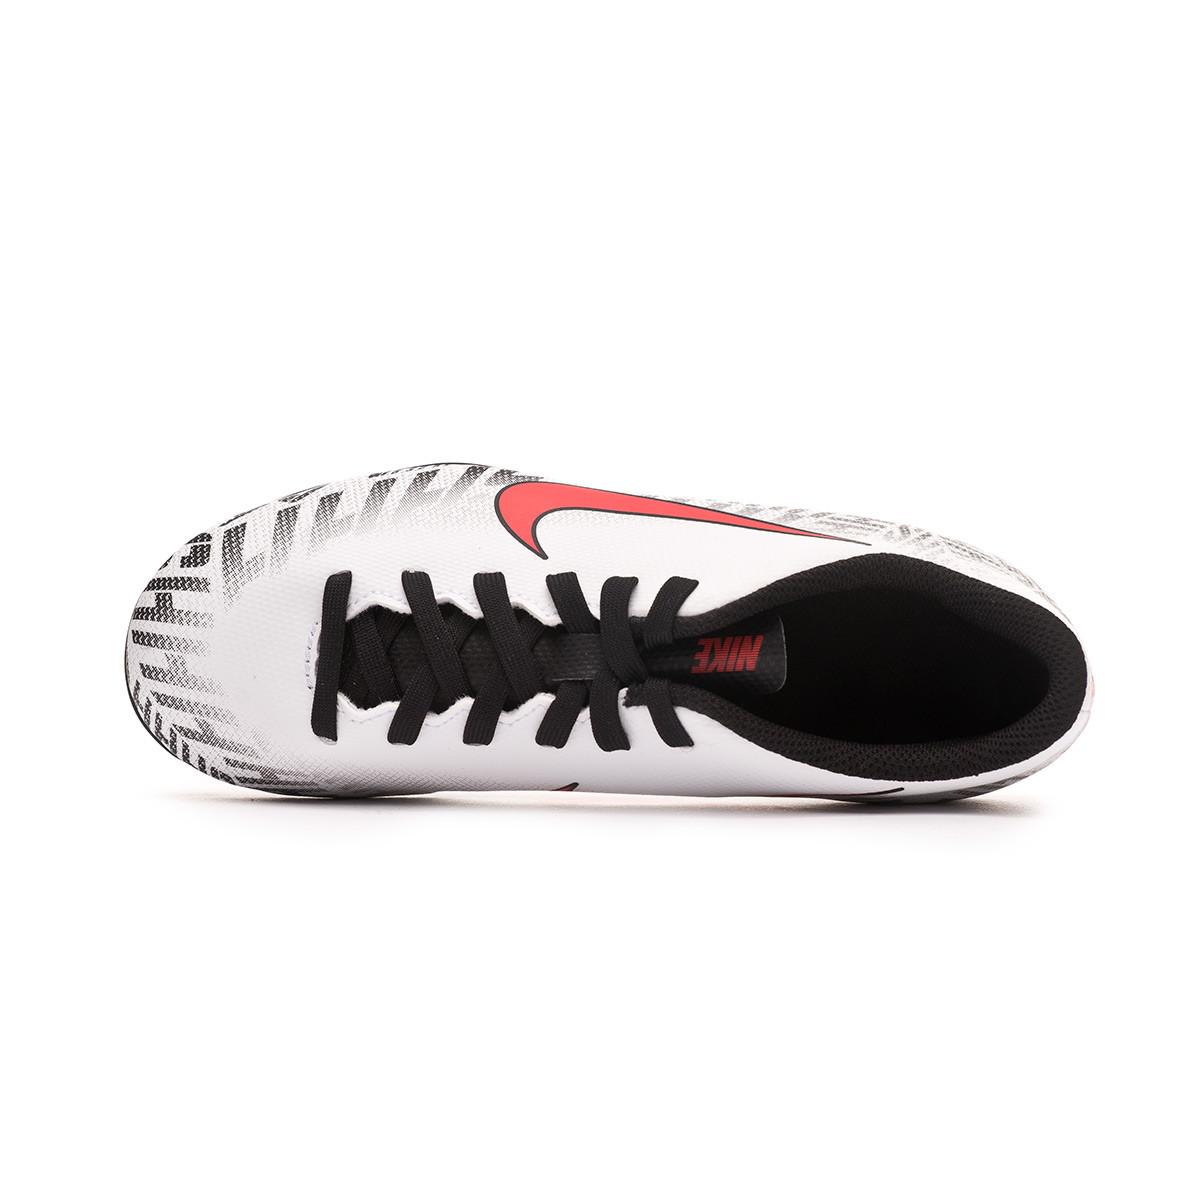 5f4fcd3e8b9 Football Boots Nike Mercurial Vapor XII Club FG Neymar Jr Niño  White-Challenge red-Black - Football store Fútbol Emotion